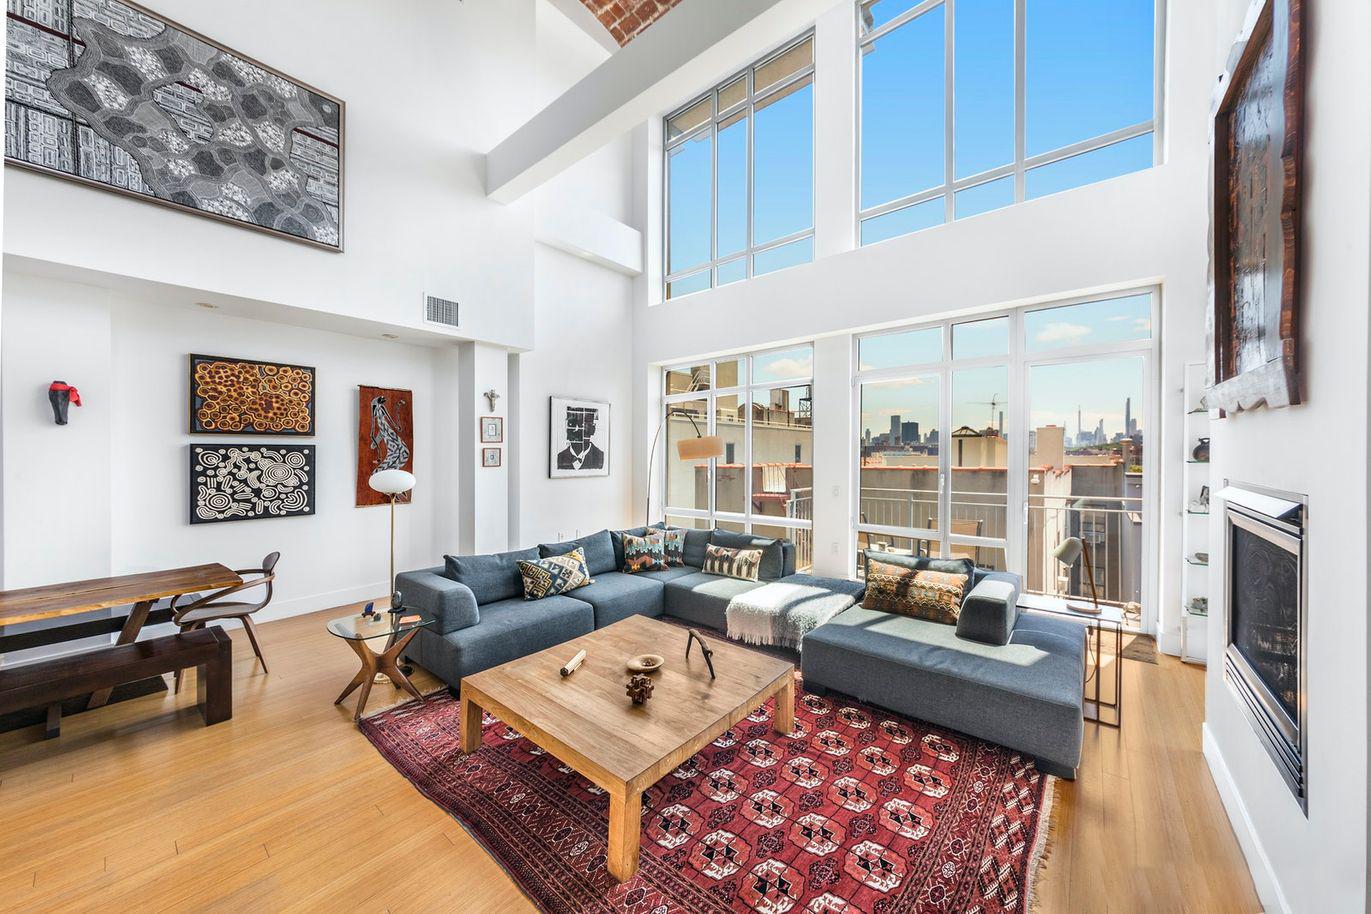 Loft 124, 138 West 124th Street